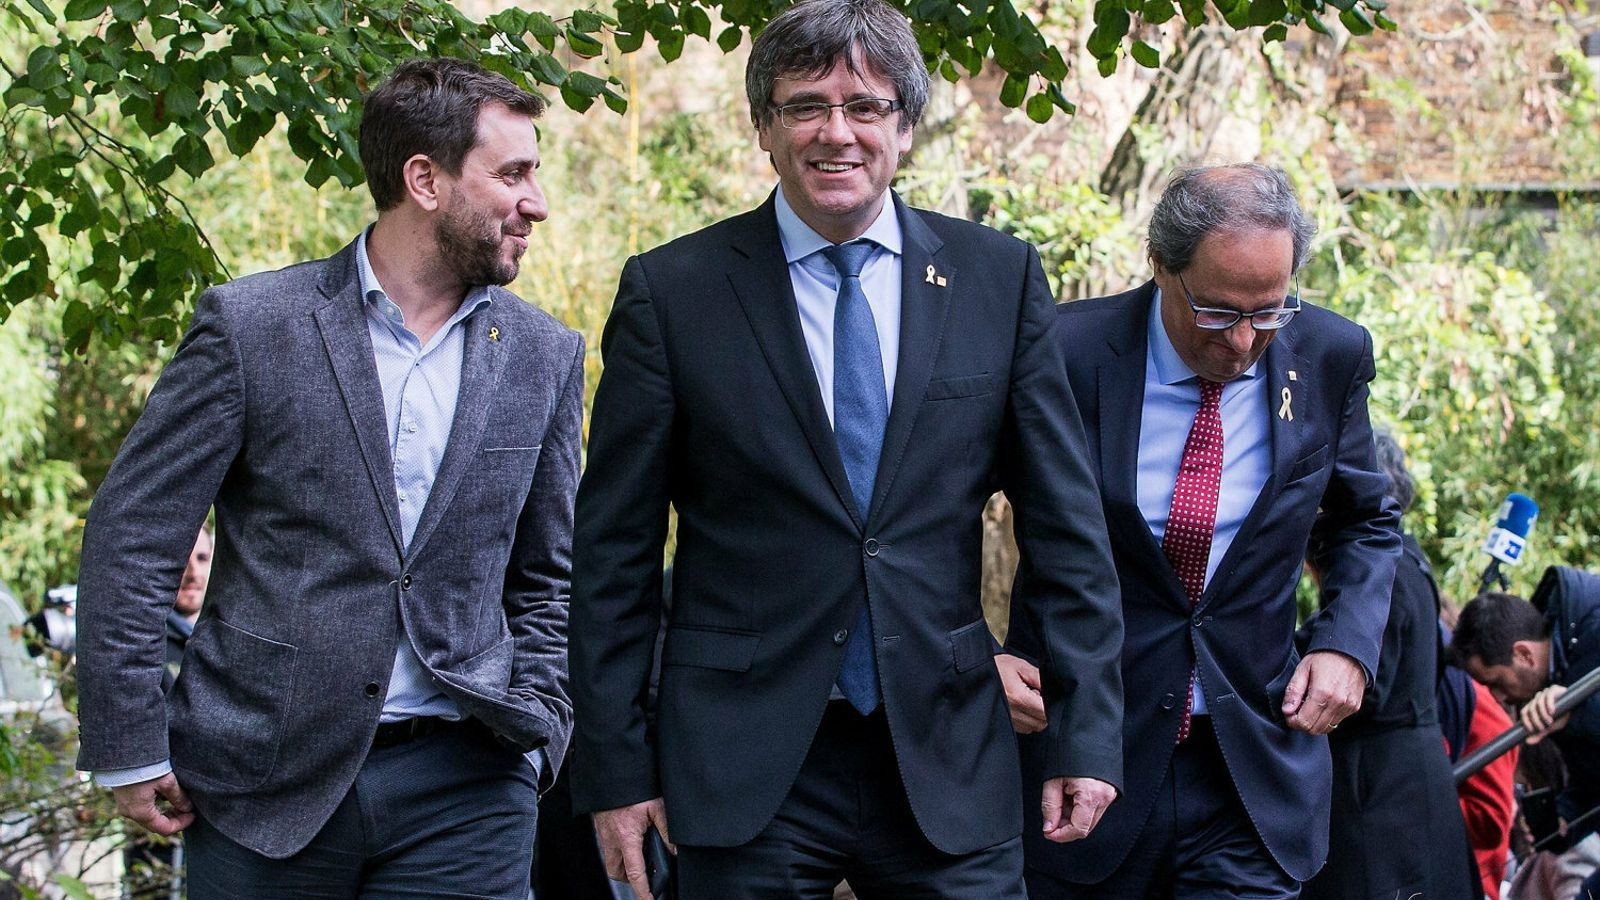 Toni Comín i Carles Puigdemont en una imatge d'arxiu. / STEPHANIE LECOCQ / EPA